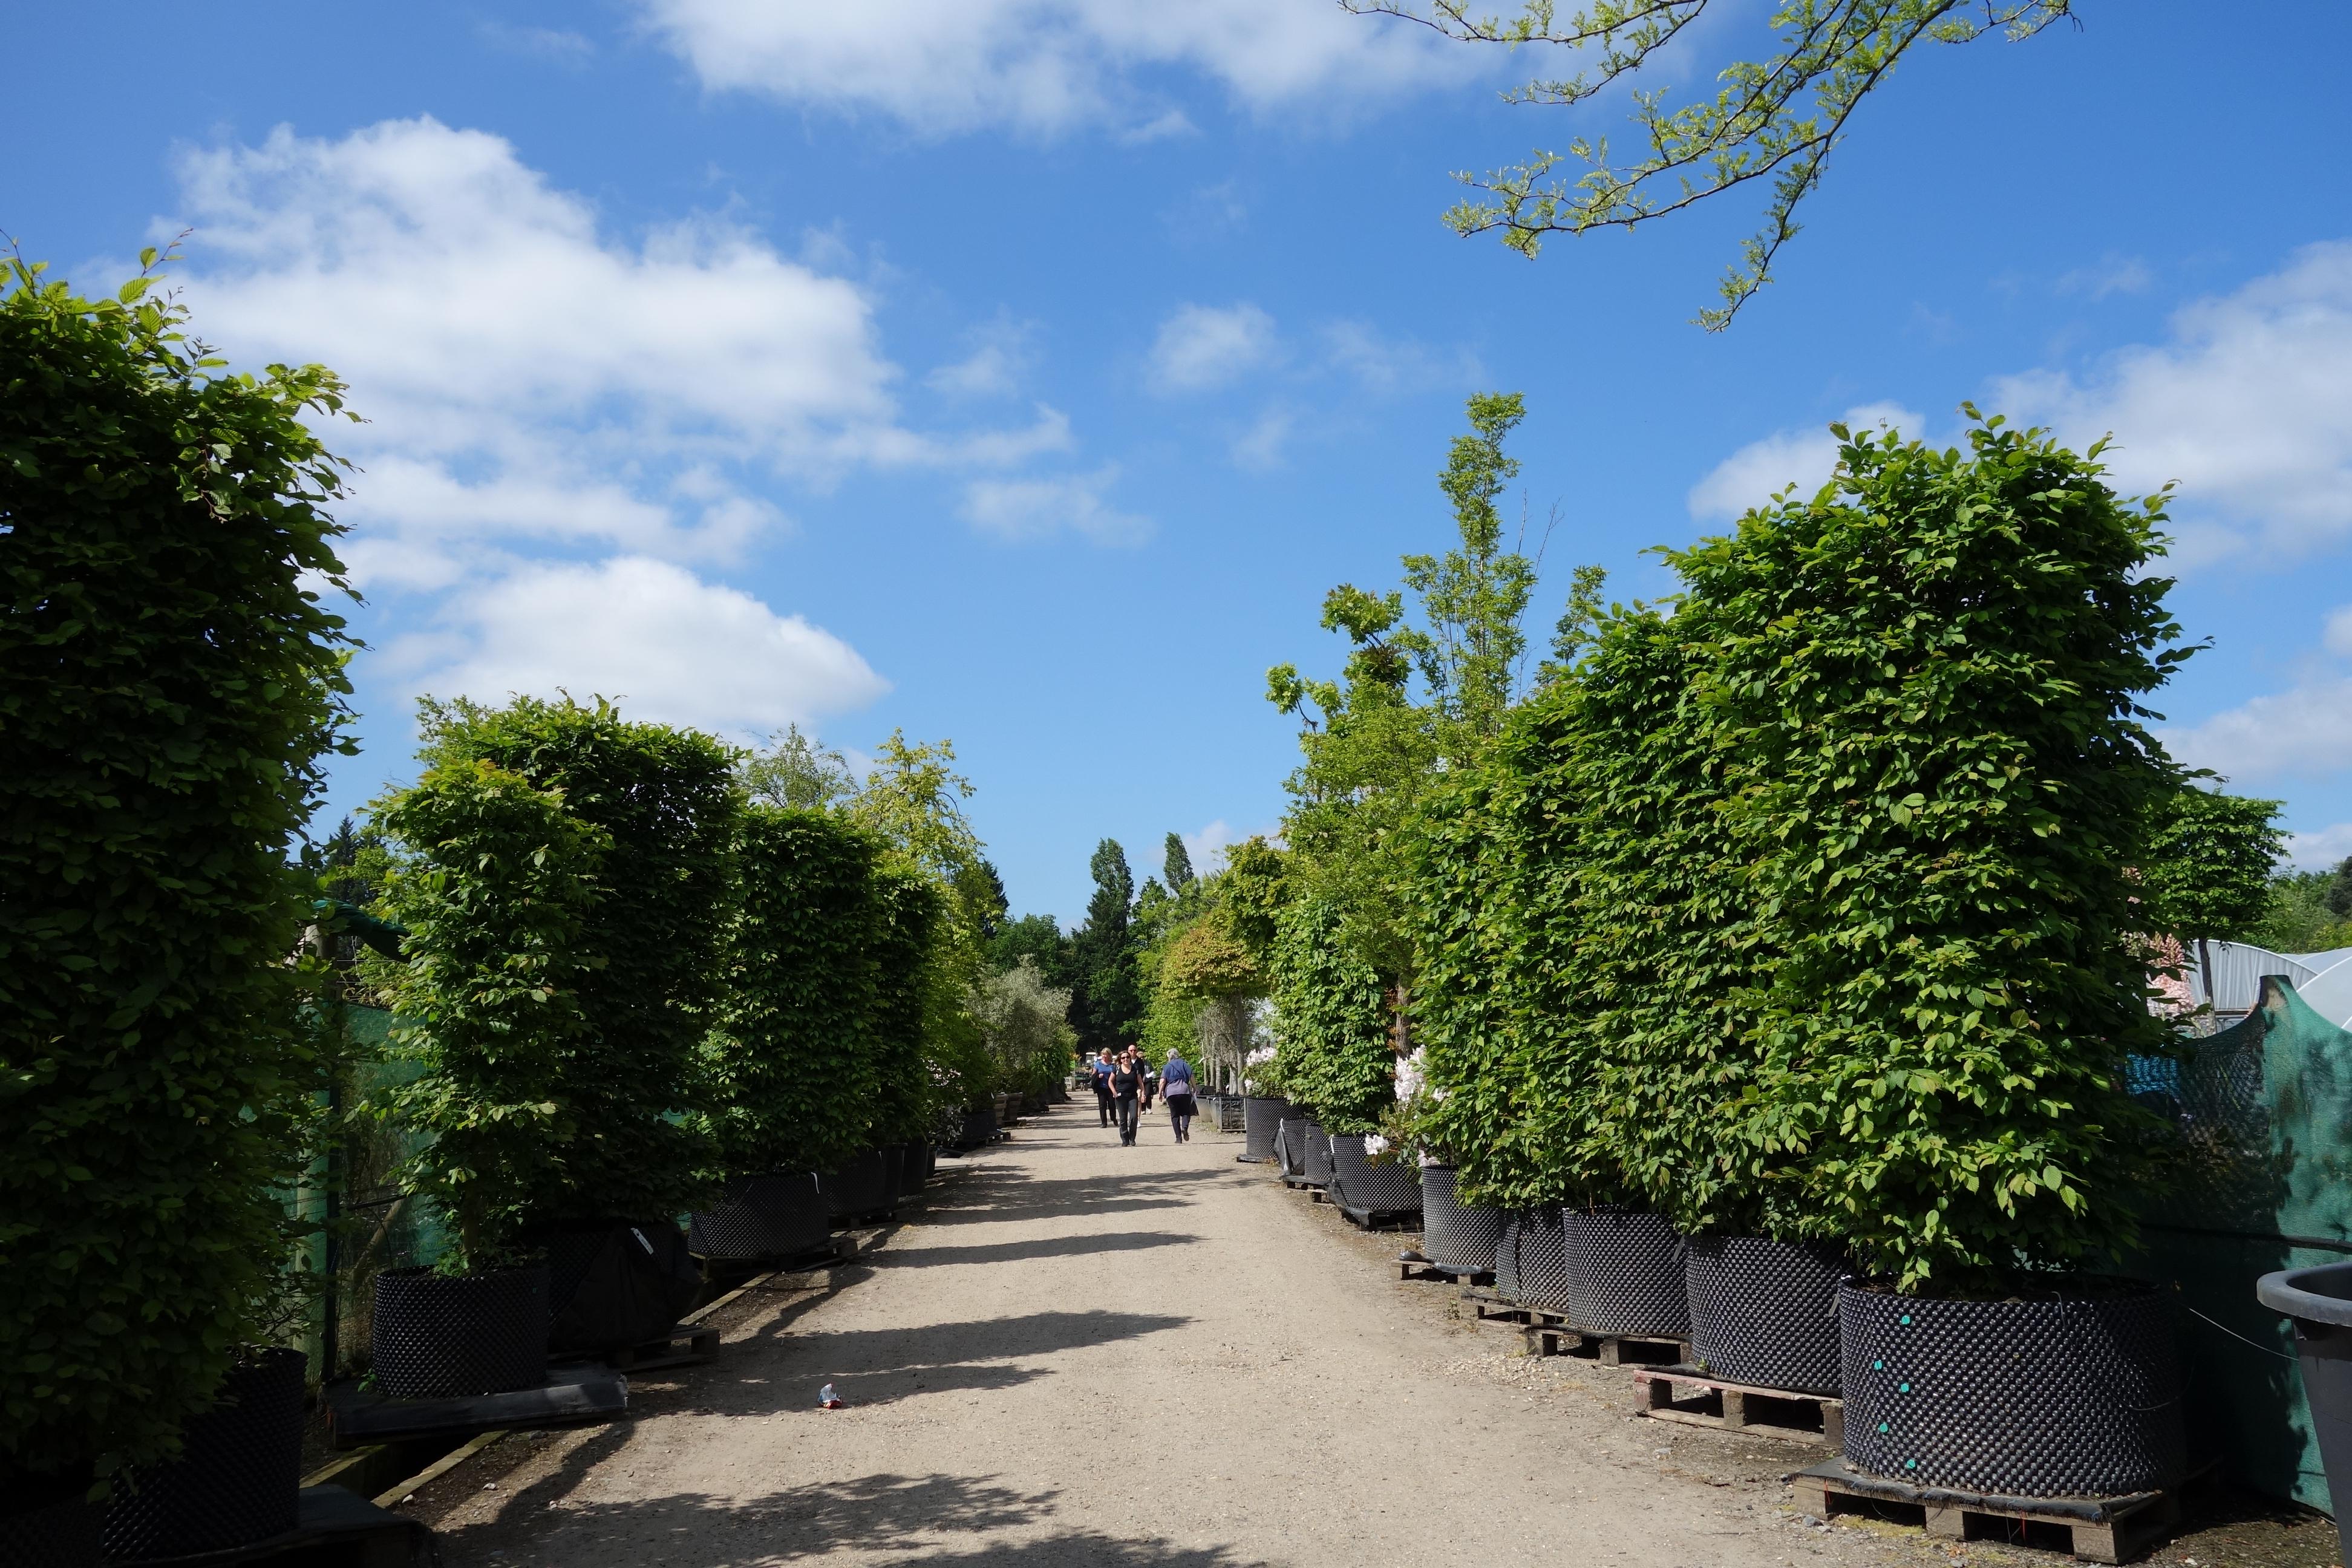 The joys of surrey heath s horticultural golden mile for Specimen trees